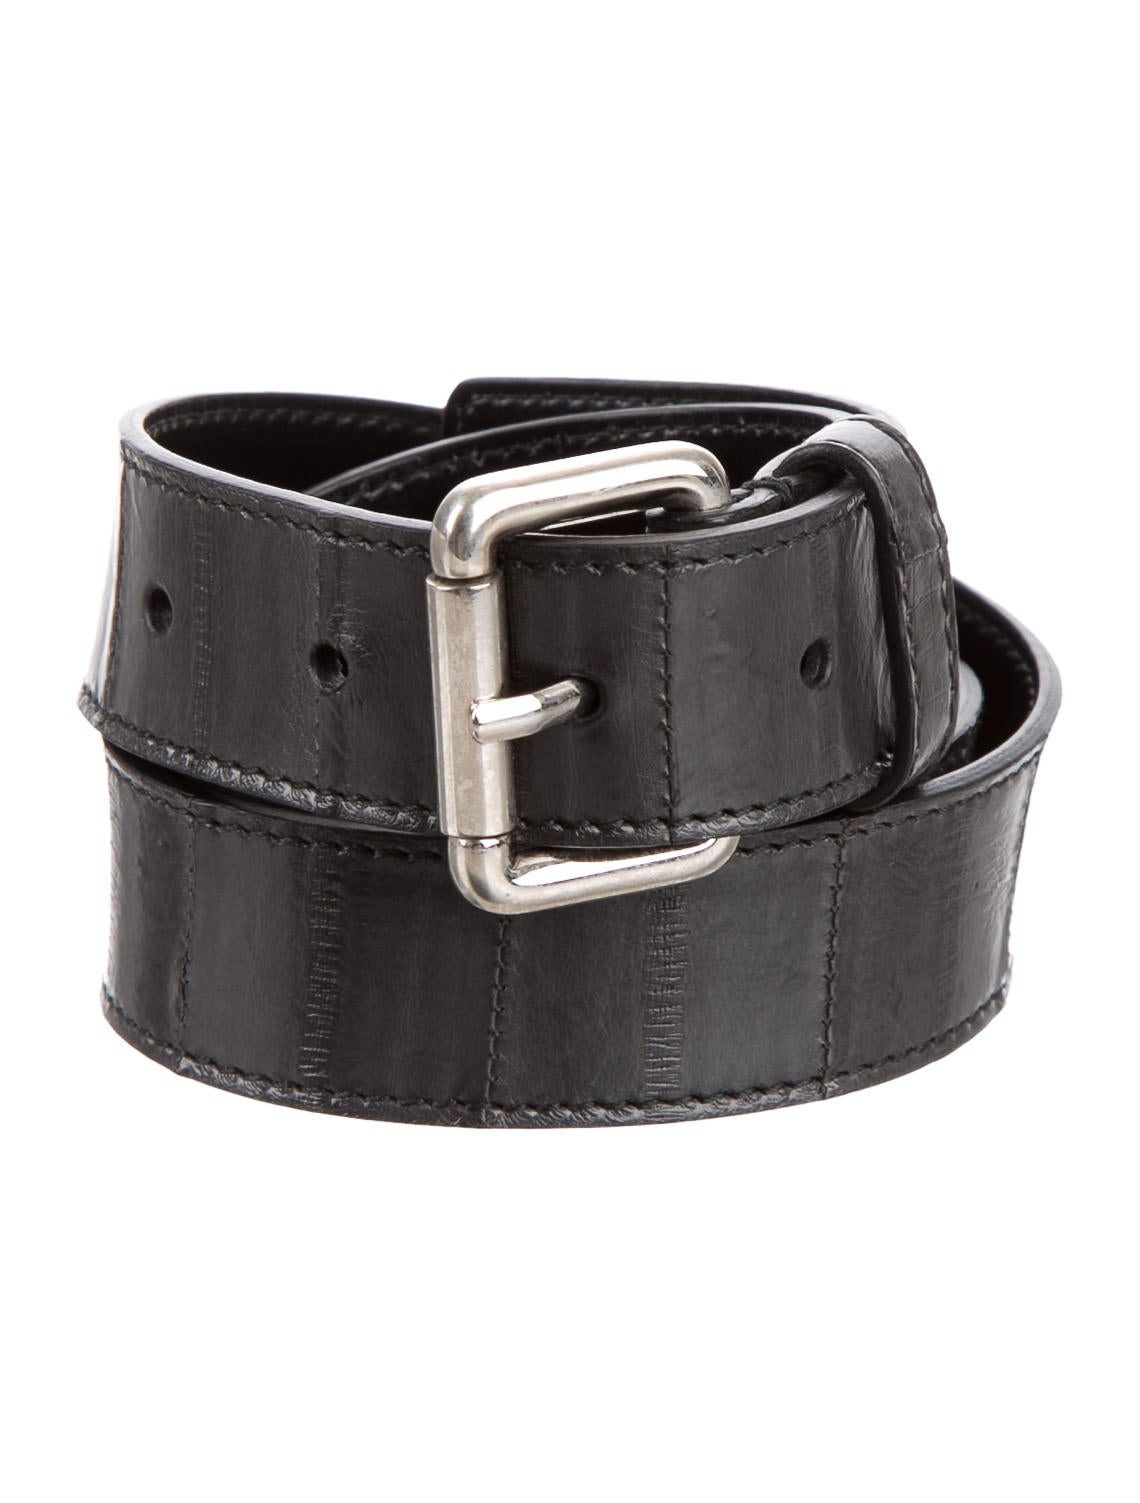 jil sander embossed leather belt accessories jil35803